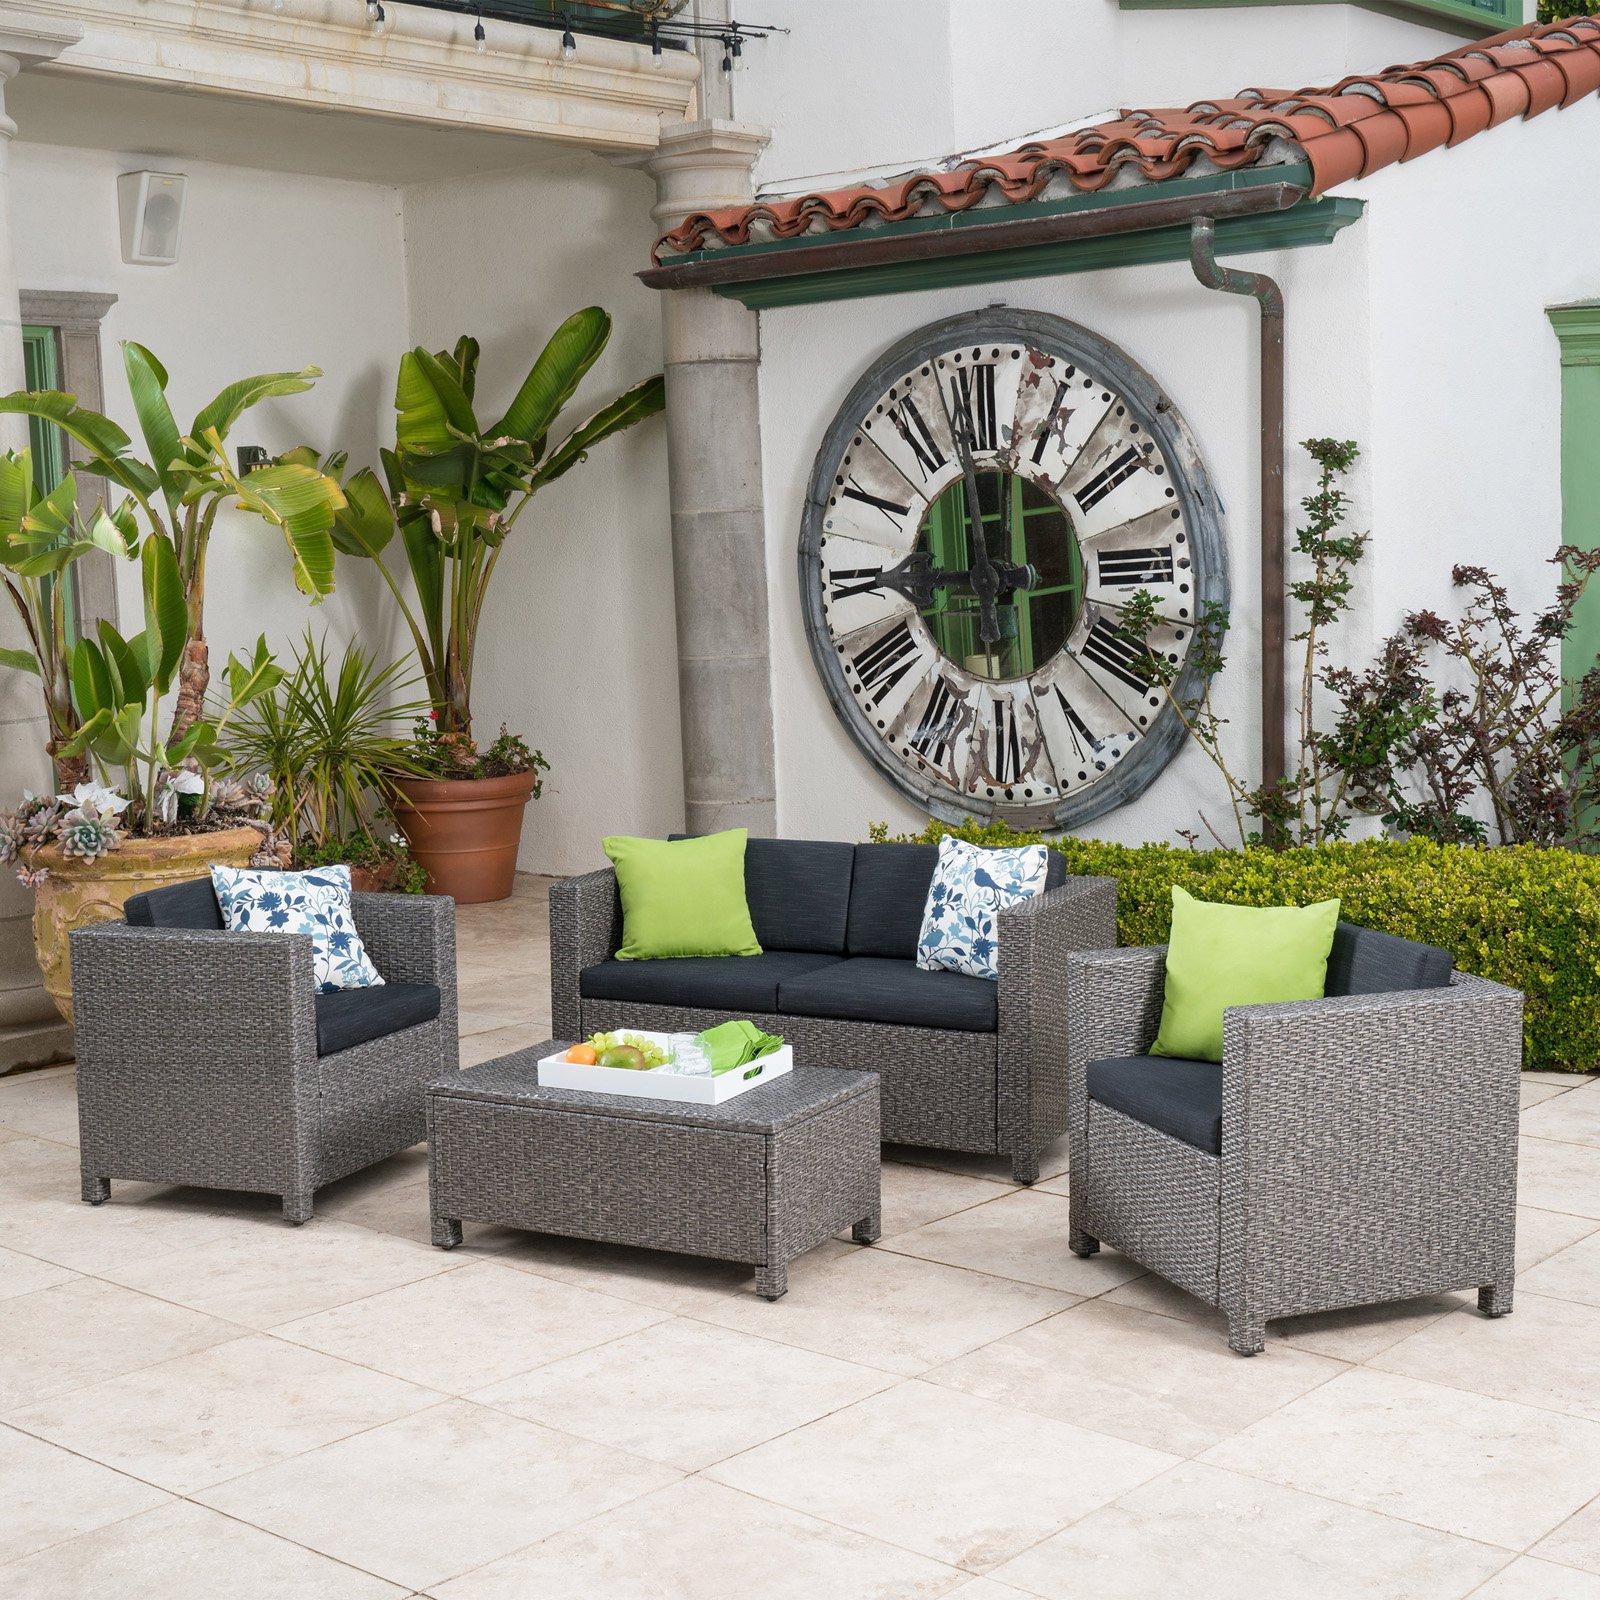 Puerta All-Weather Wicker Conversation Set - Seats 4